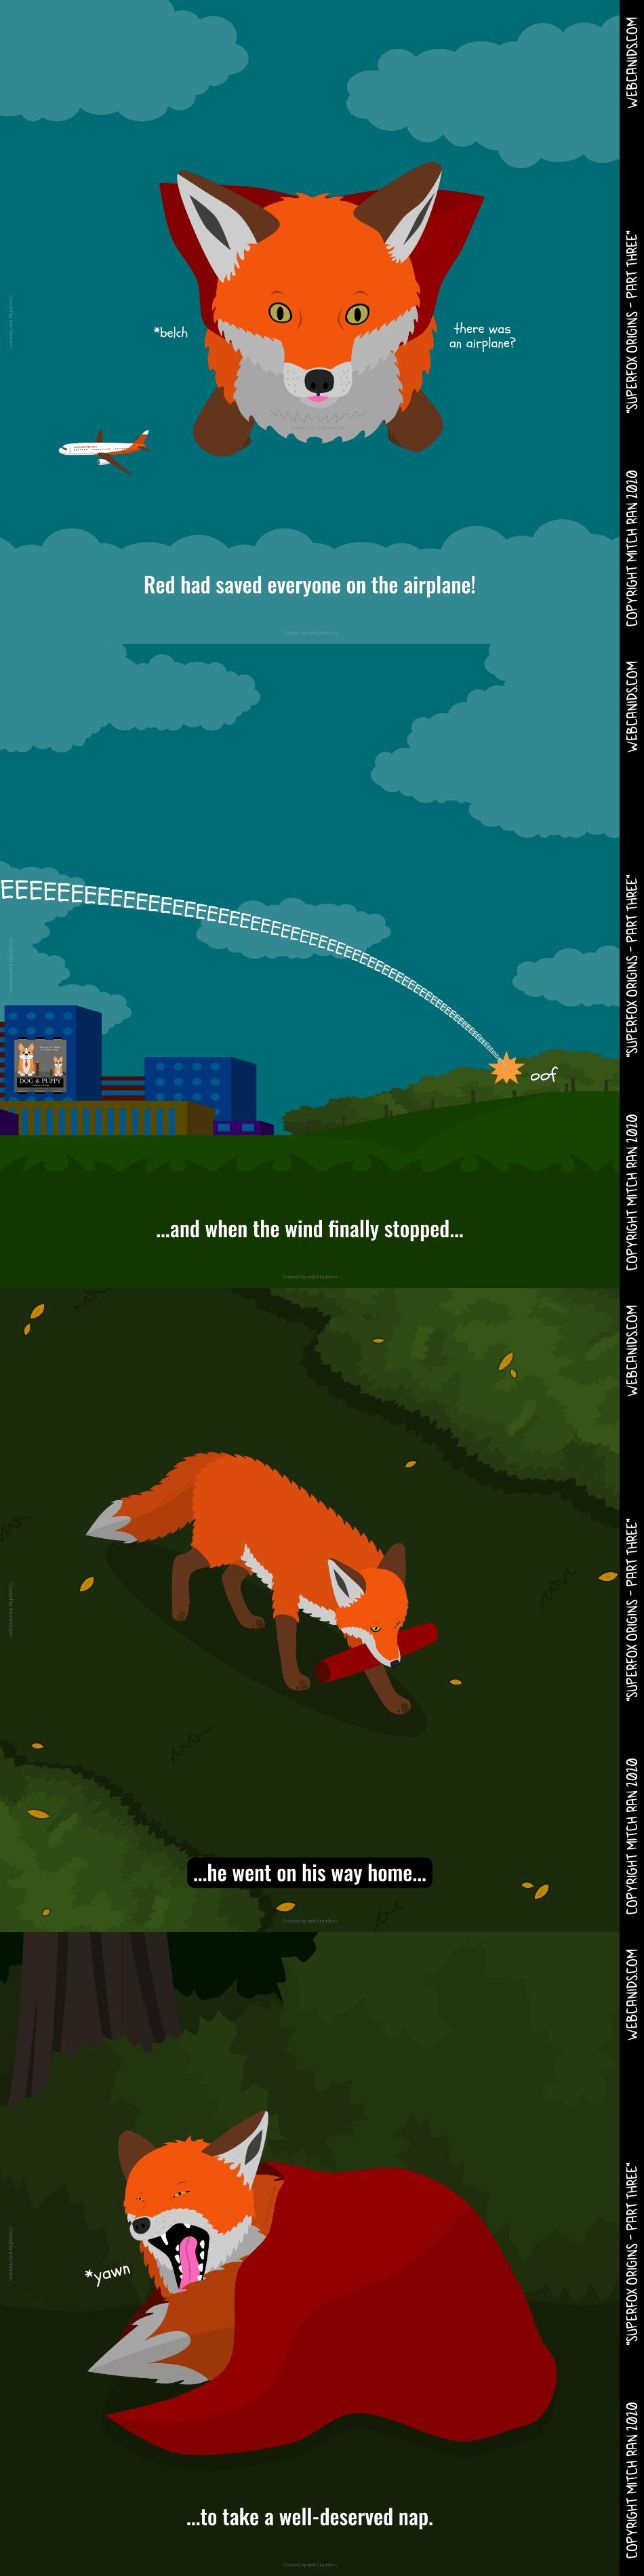 SuperFox Origins - Part Three - End